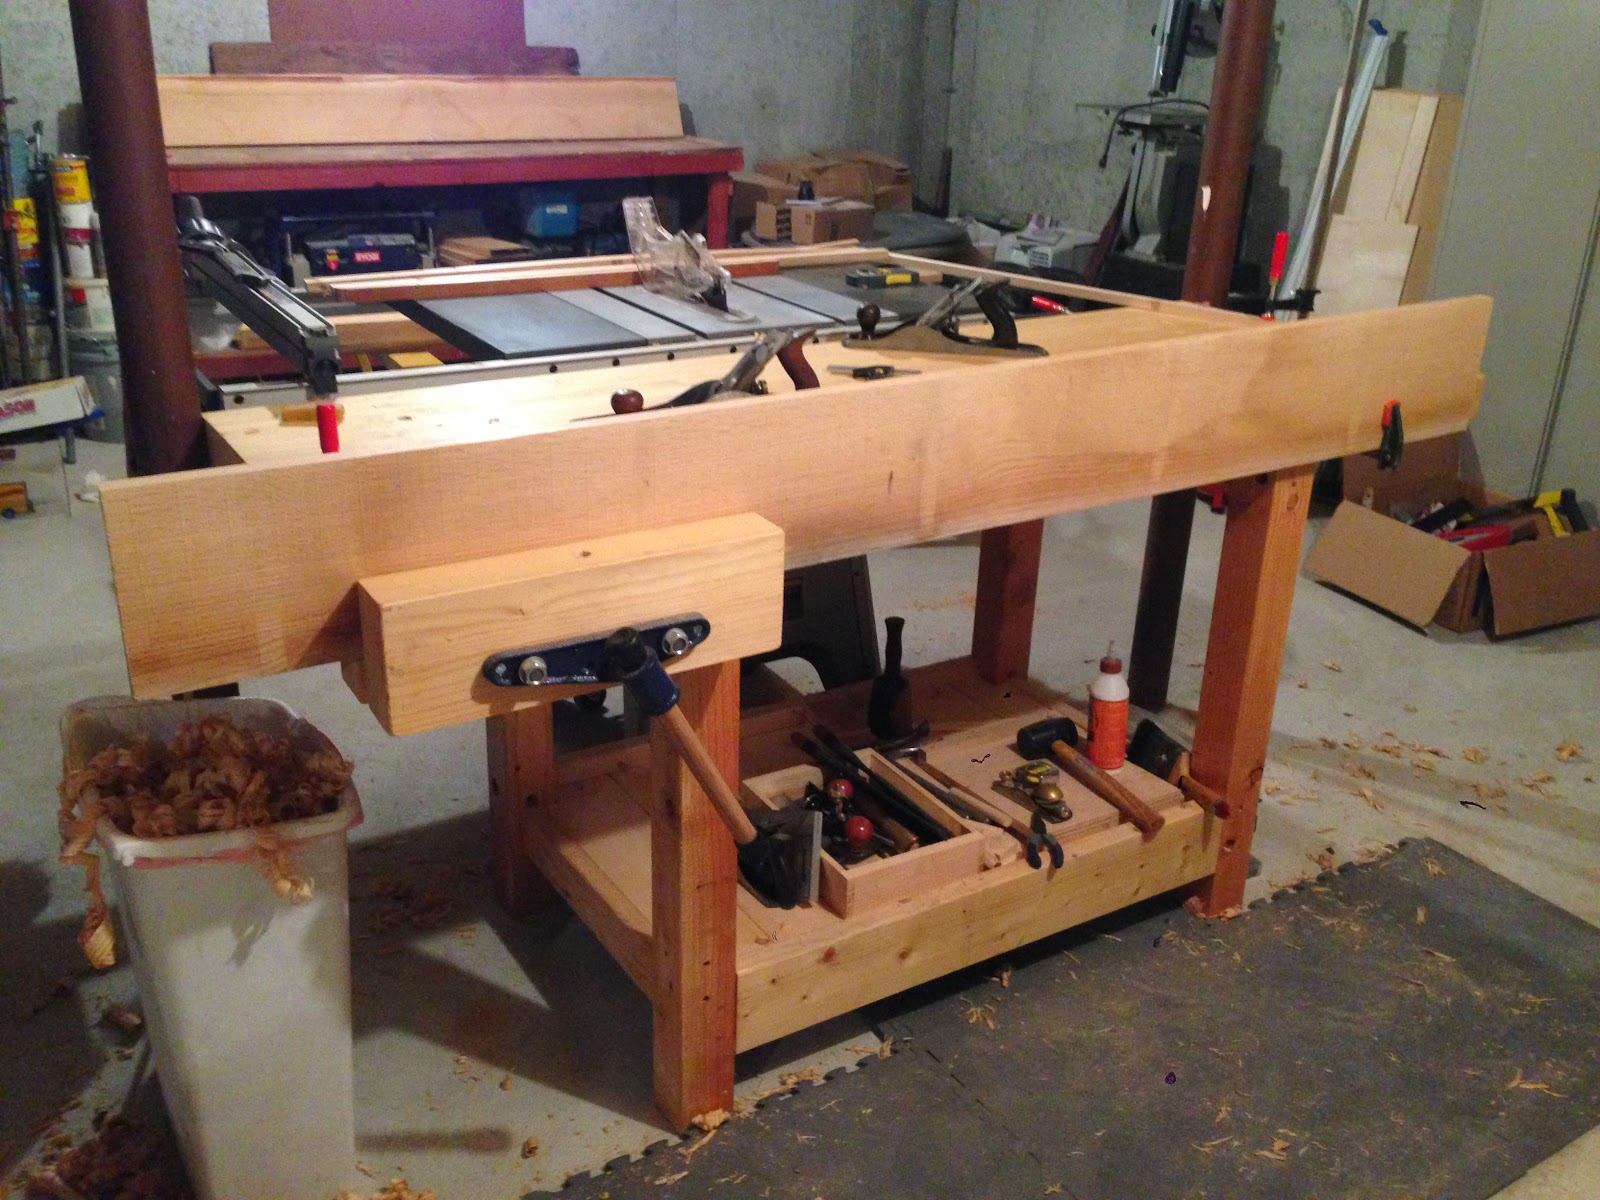 Woodcraft hours - Lakeland plastics discount code